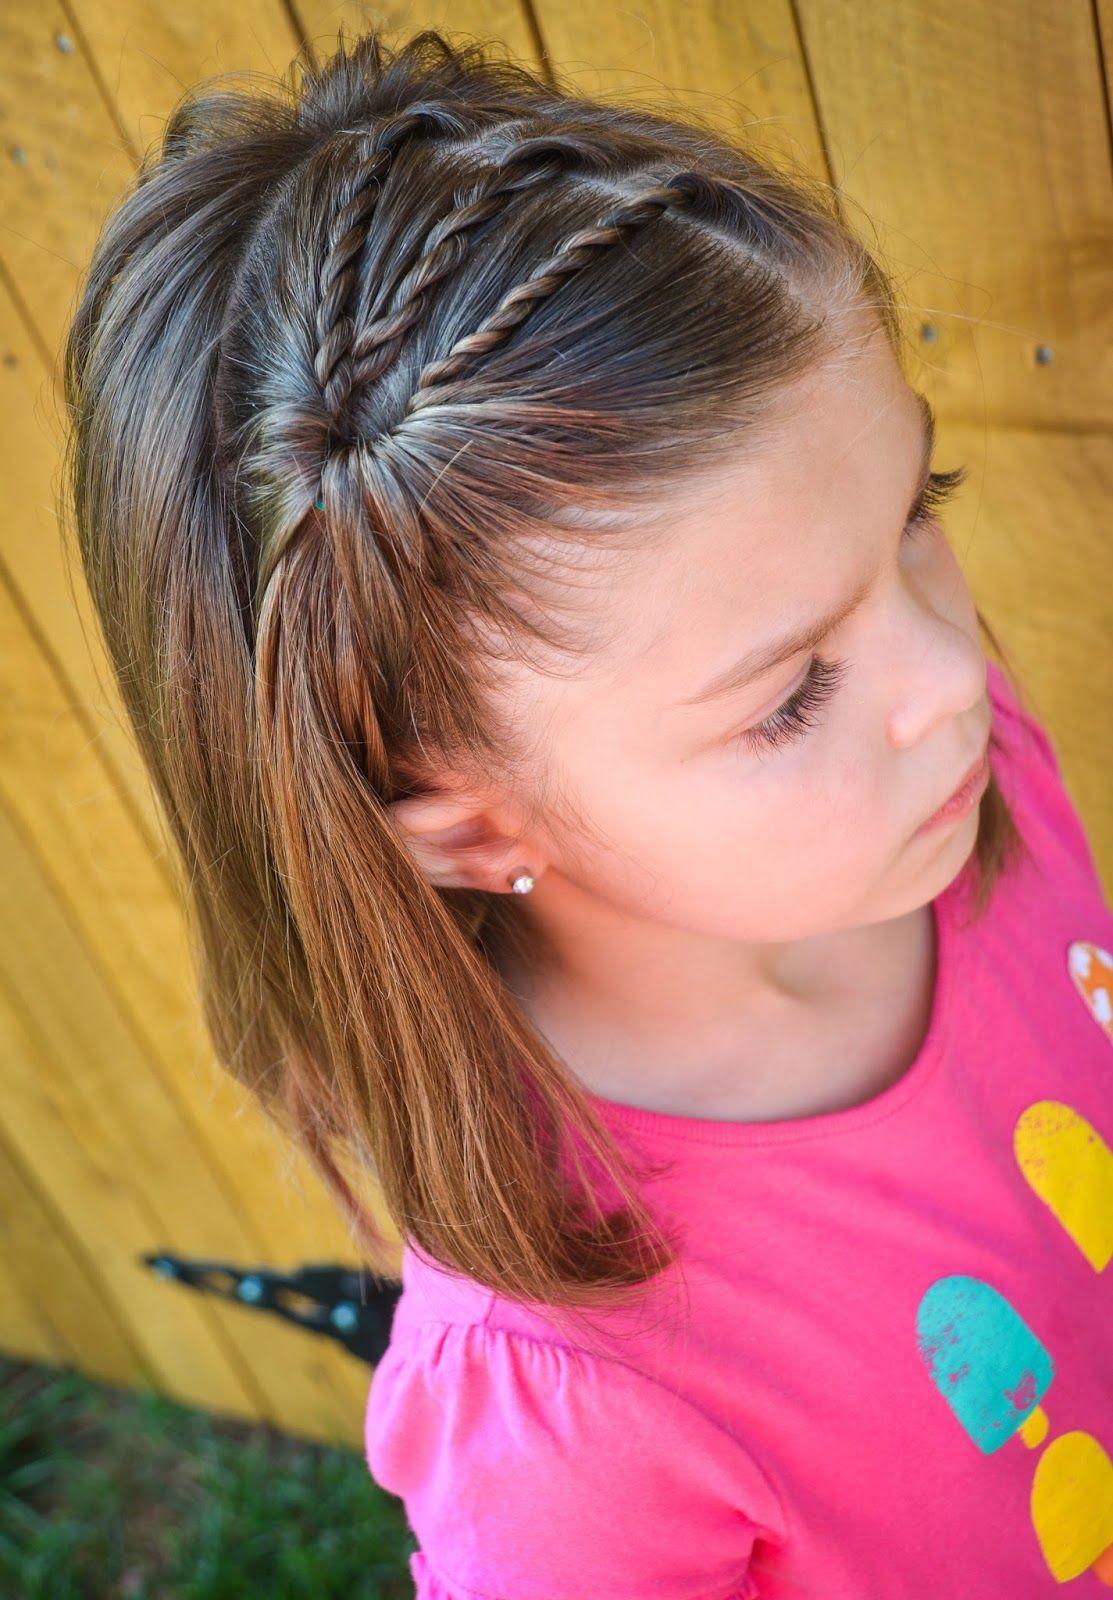 Pin by dolly hernandez torres on peinados para hacer pinterest